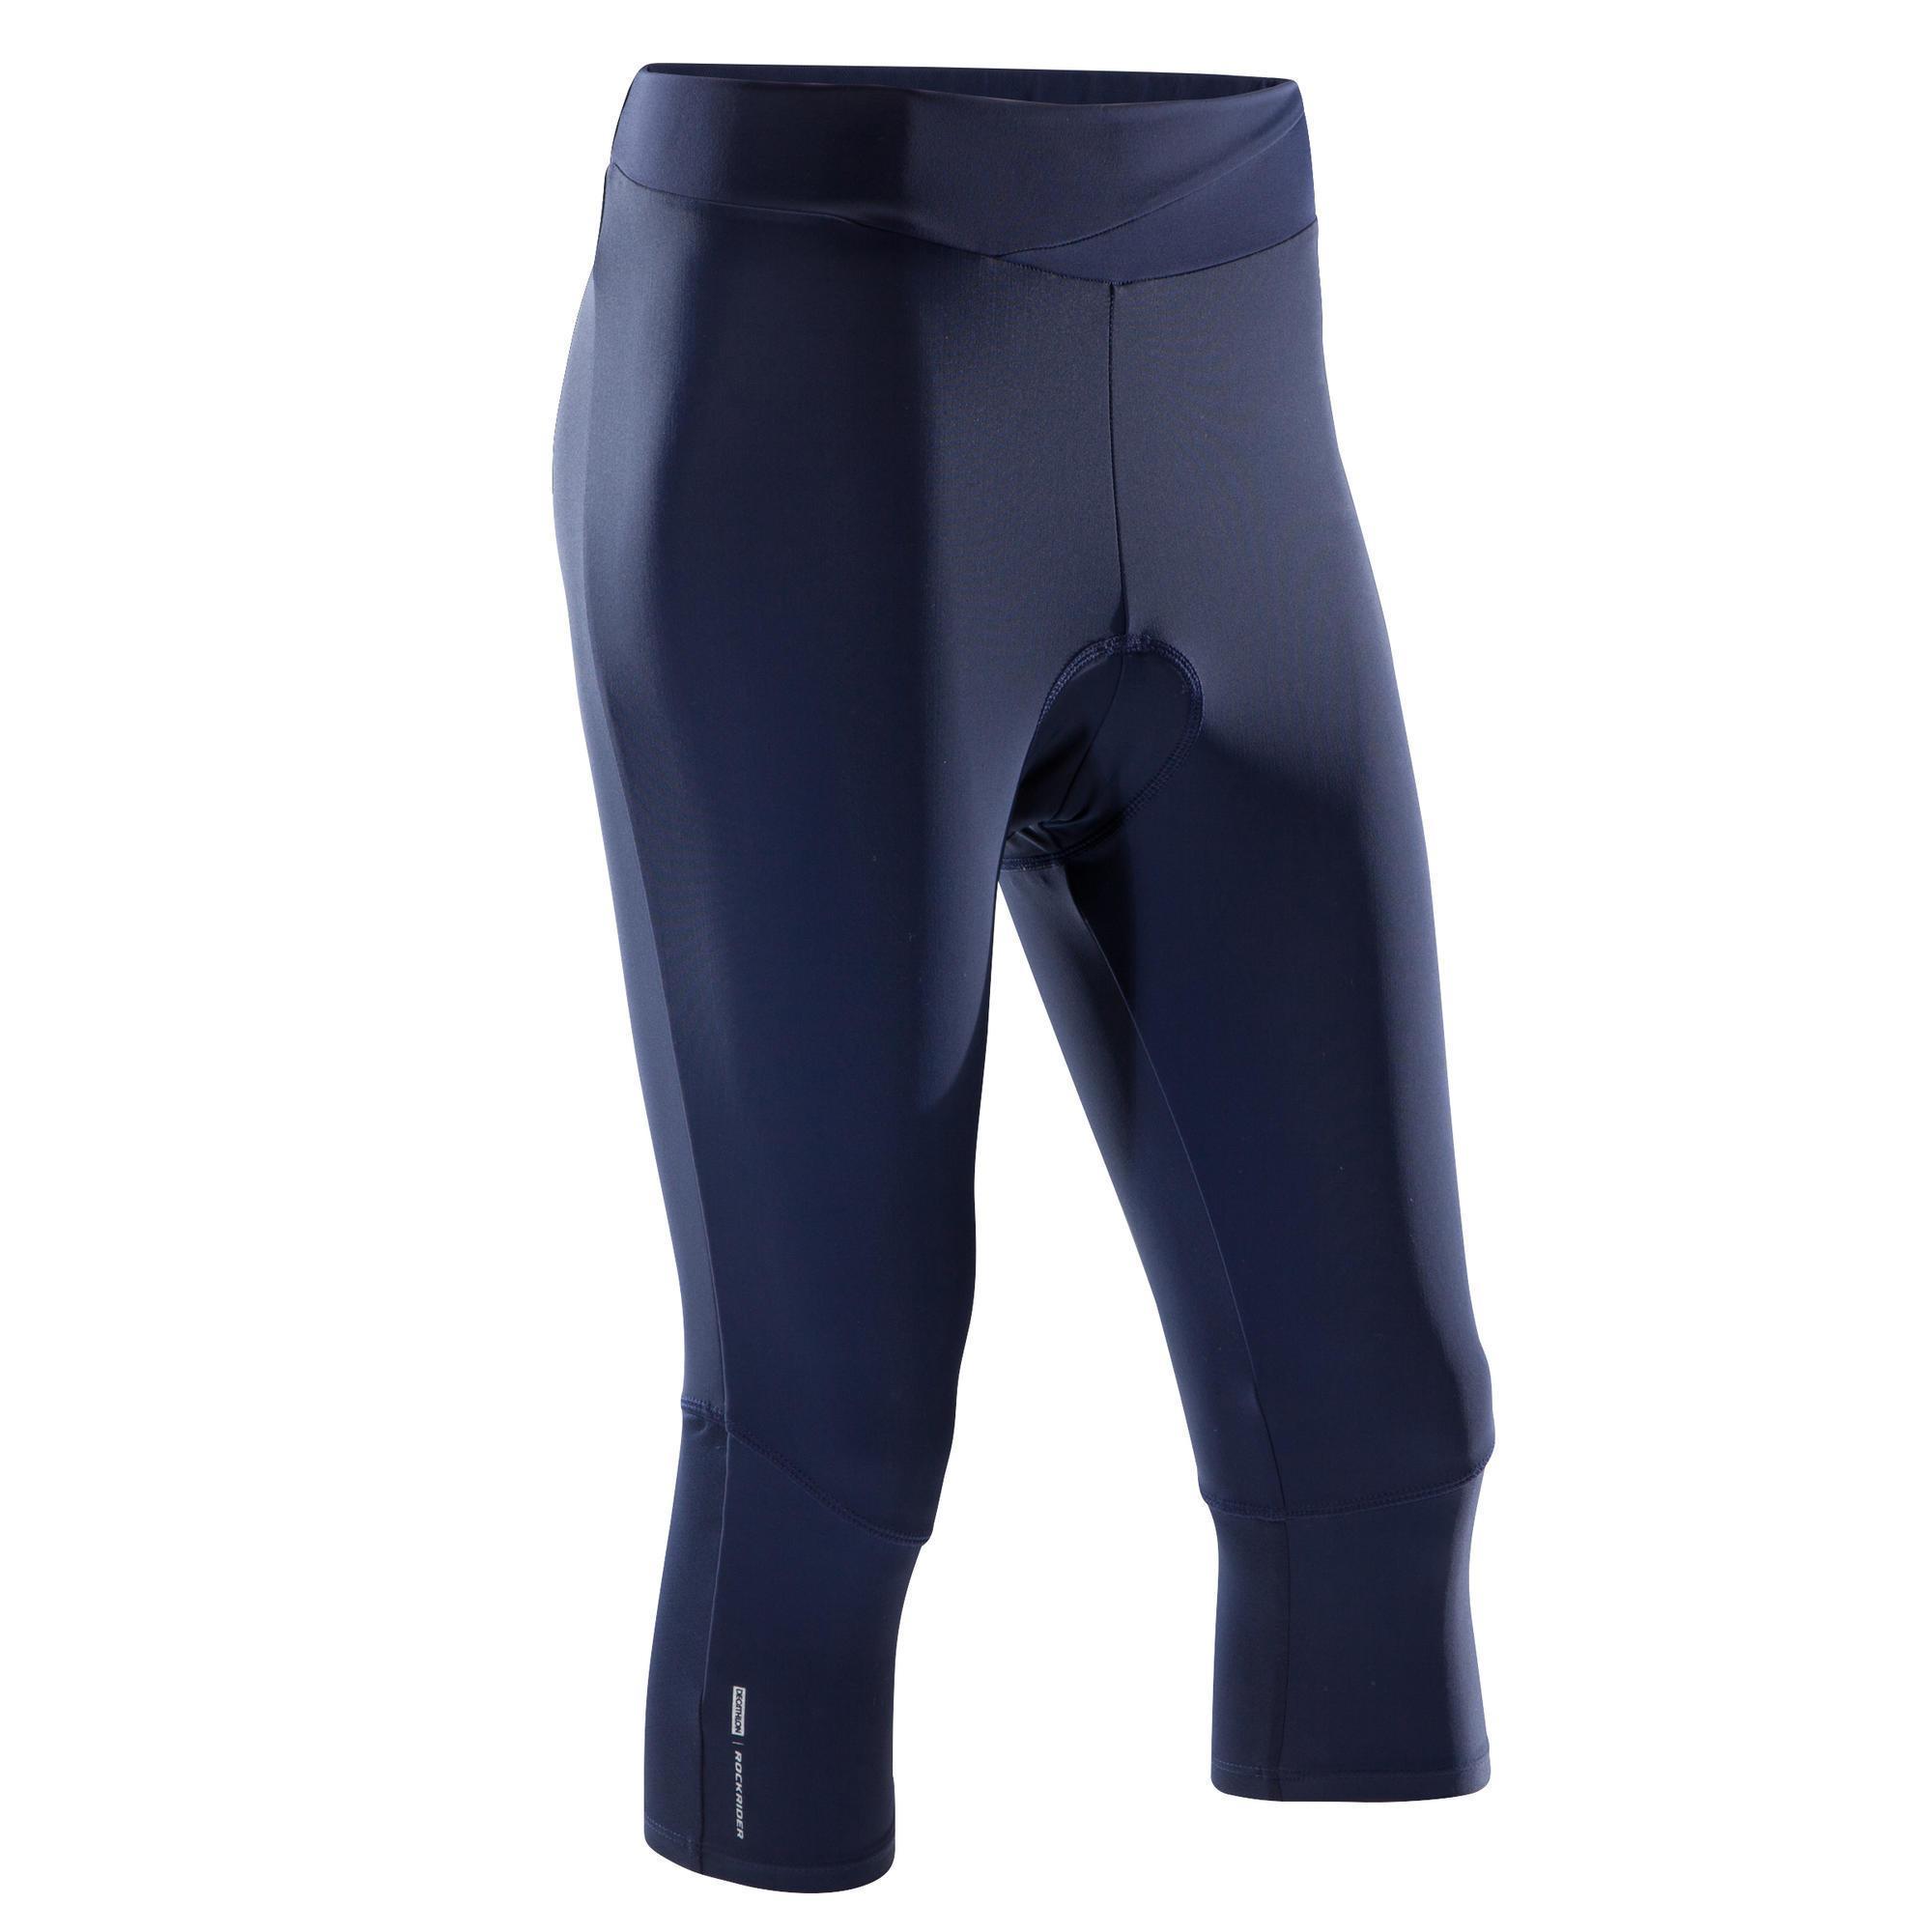 Rockrider MTB-broek ST500 dames marineblauw kopen